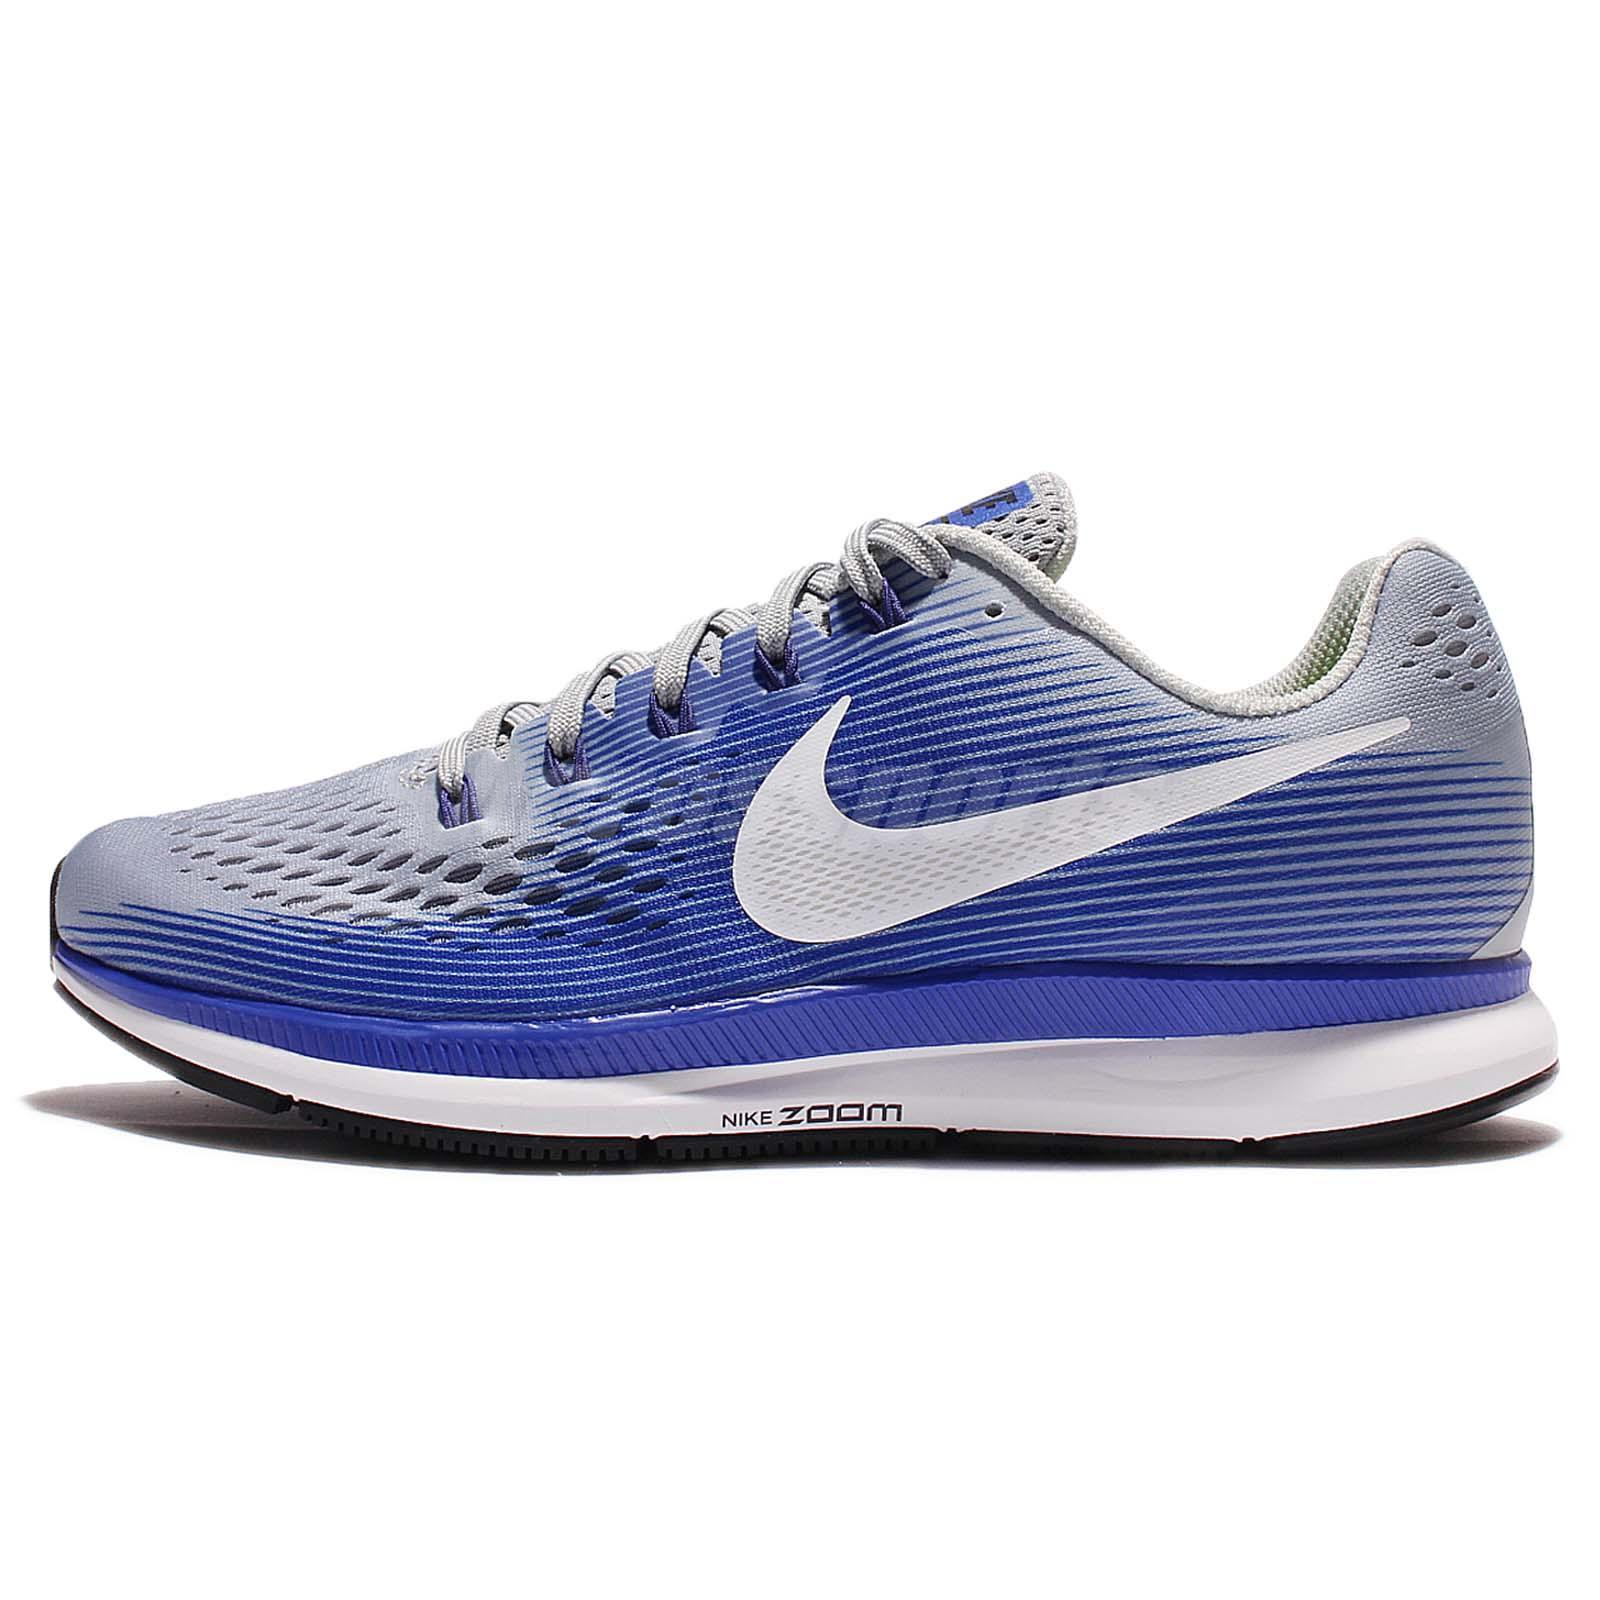 81b1115421bd0 Nike Air Zoom Pegasus 34 Racer Blue Grey Men Running Shoes Sneakers 880555 -007